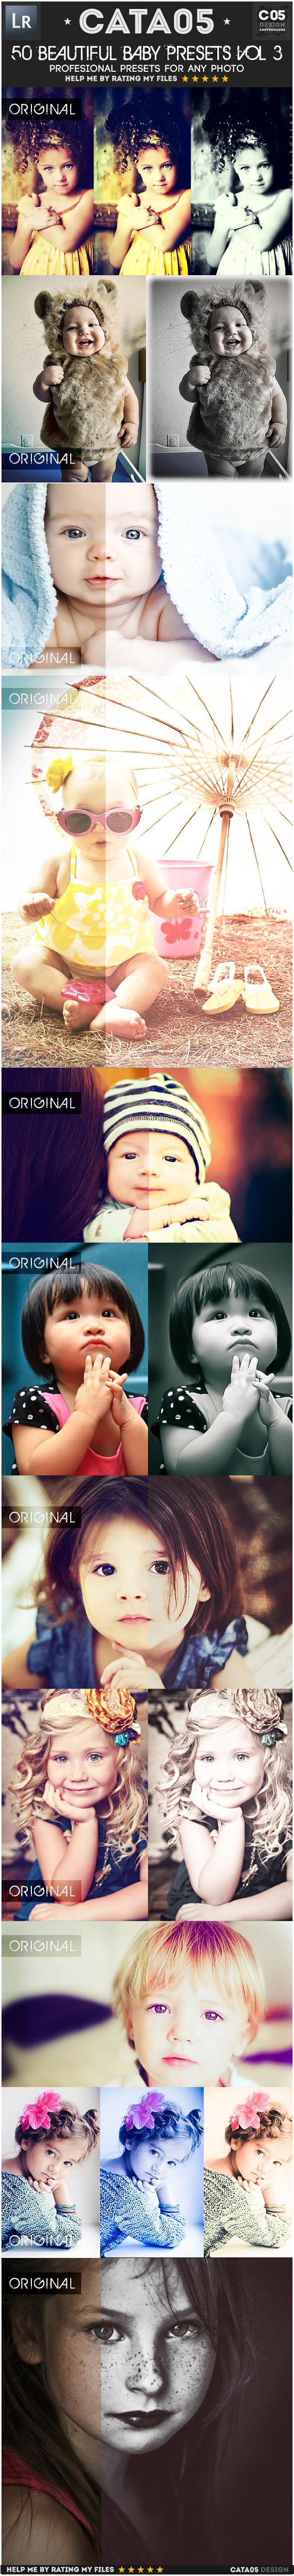 50 Beautiful Baby Presets Vol 3 - Portrait Lightroom Presets